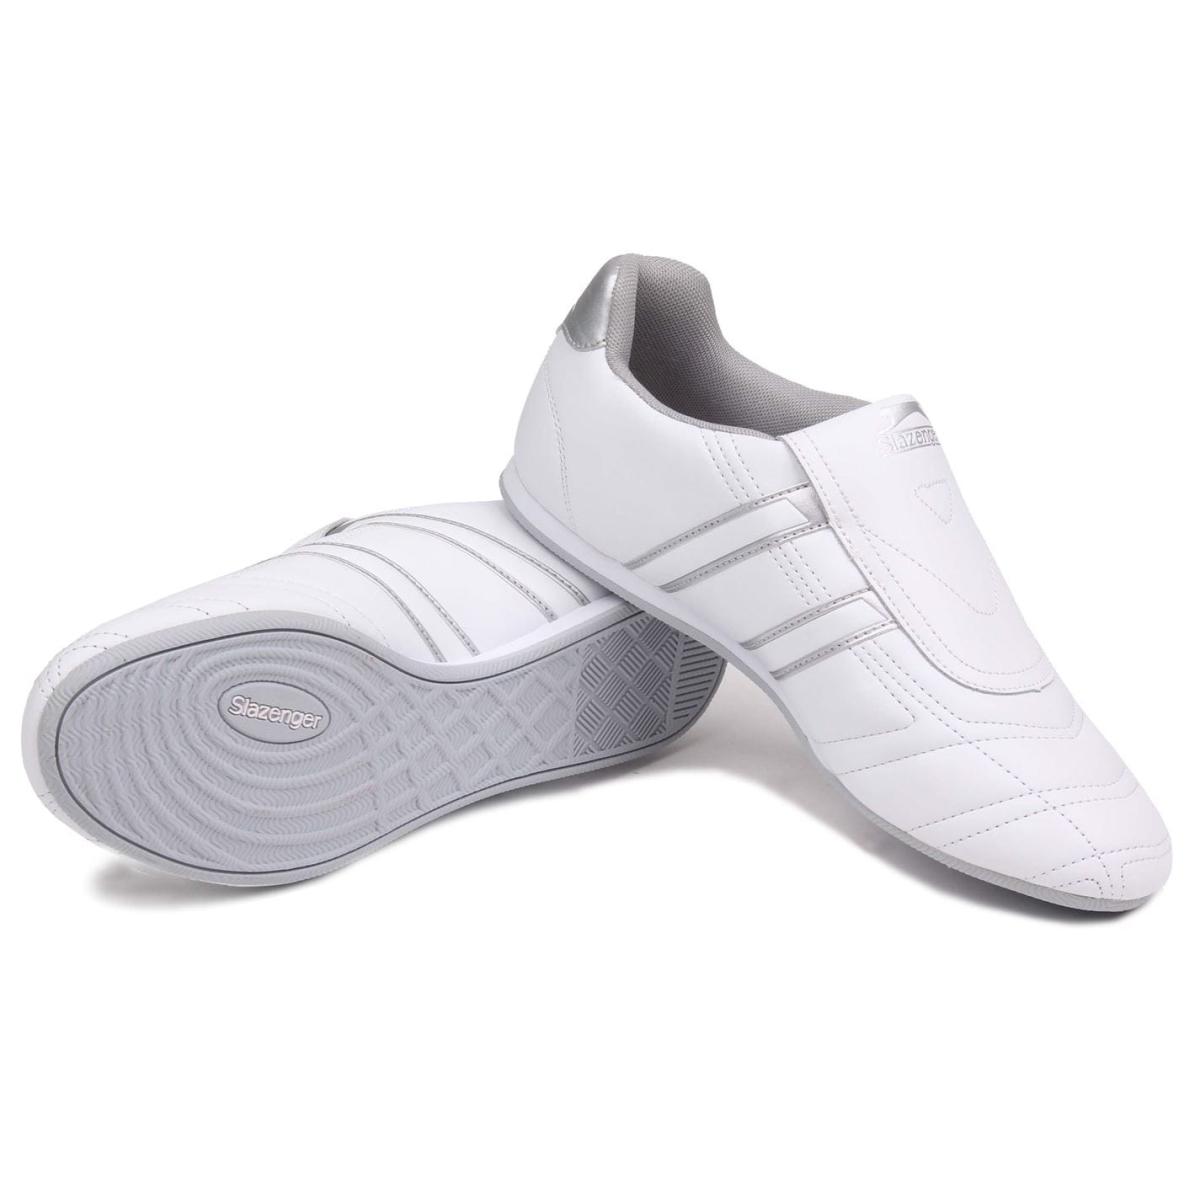 Slazenger-Turnschuhe-Damen-Sneaker-Sportschuhe-Laufschuhe-Warrior-5087 Indexbild 11